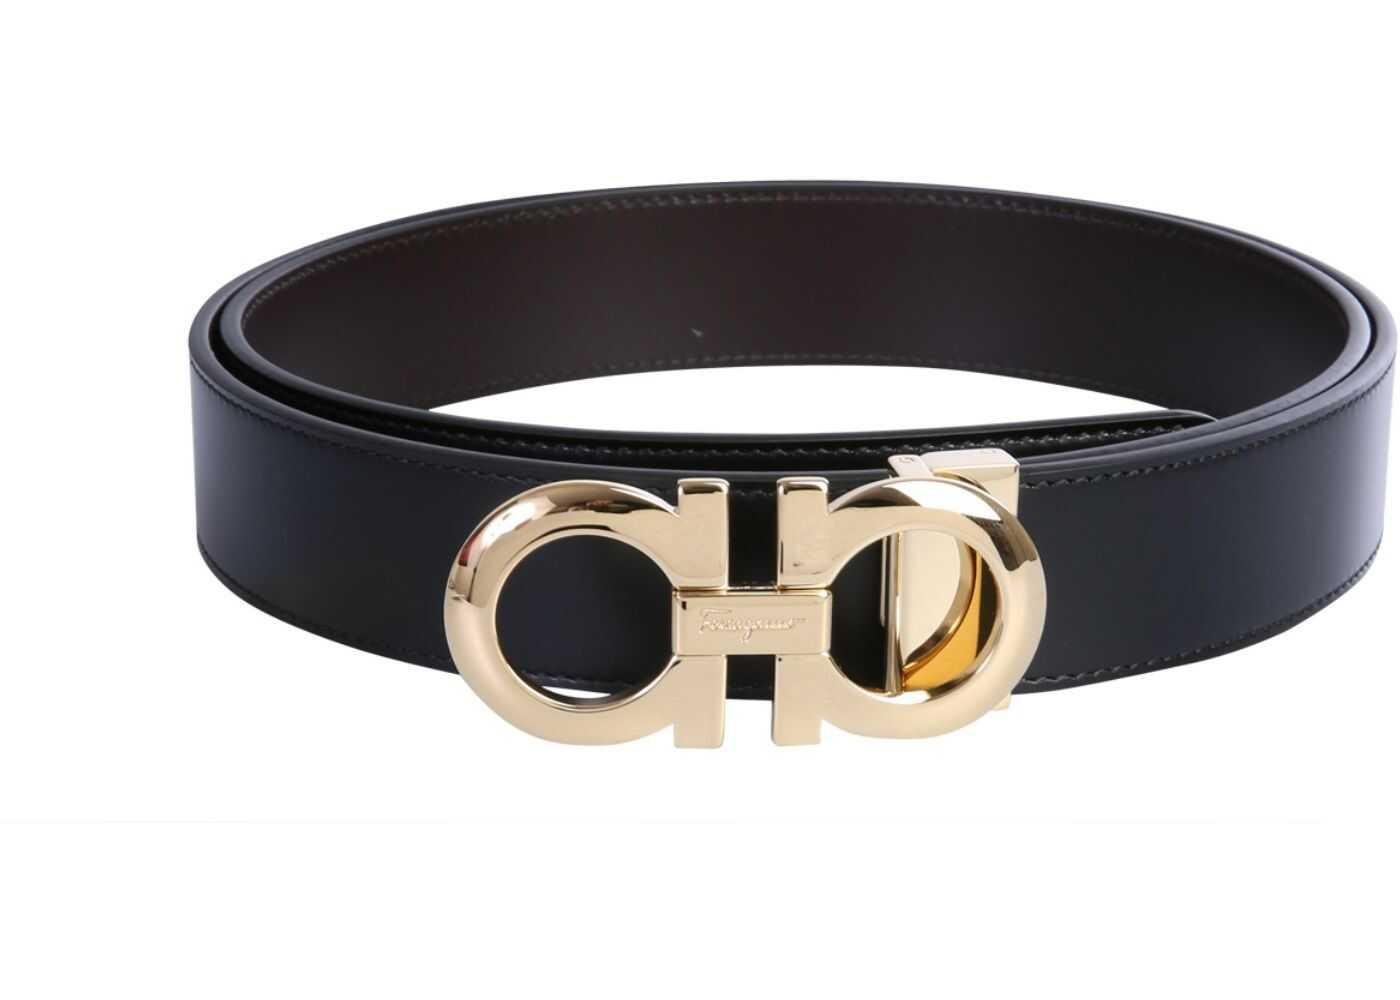 Salvatore Ferragamo Reversible Double Hook Belt BLACK